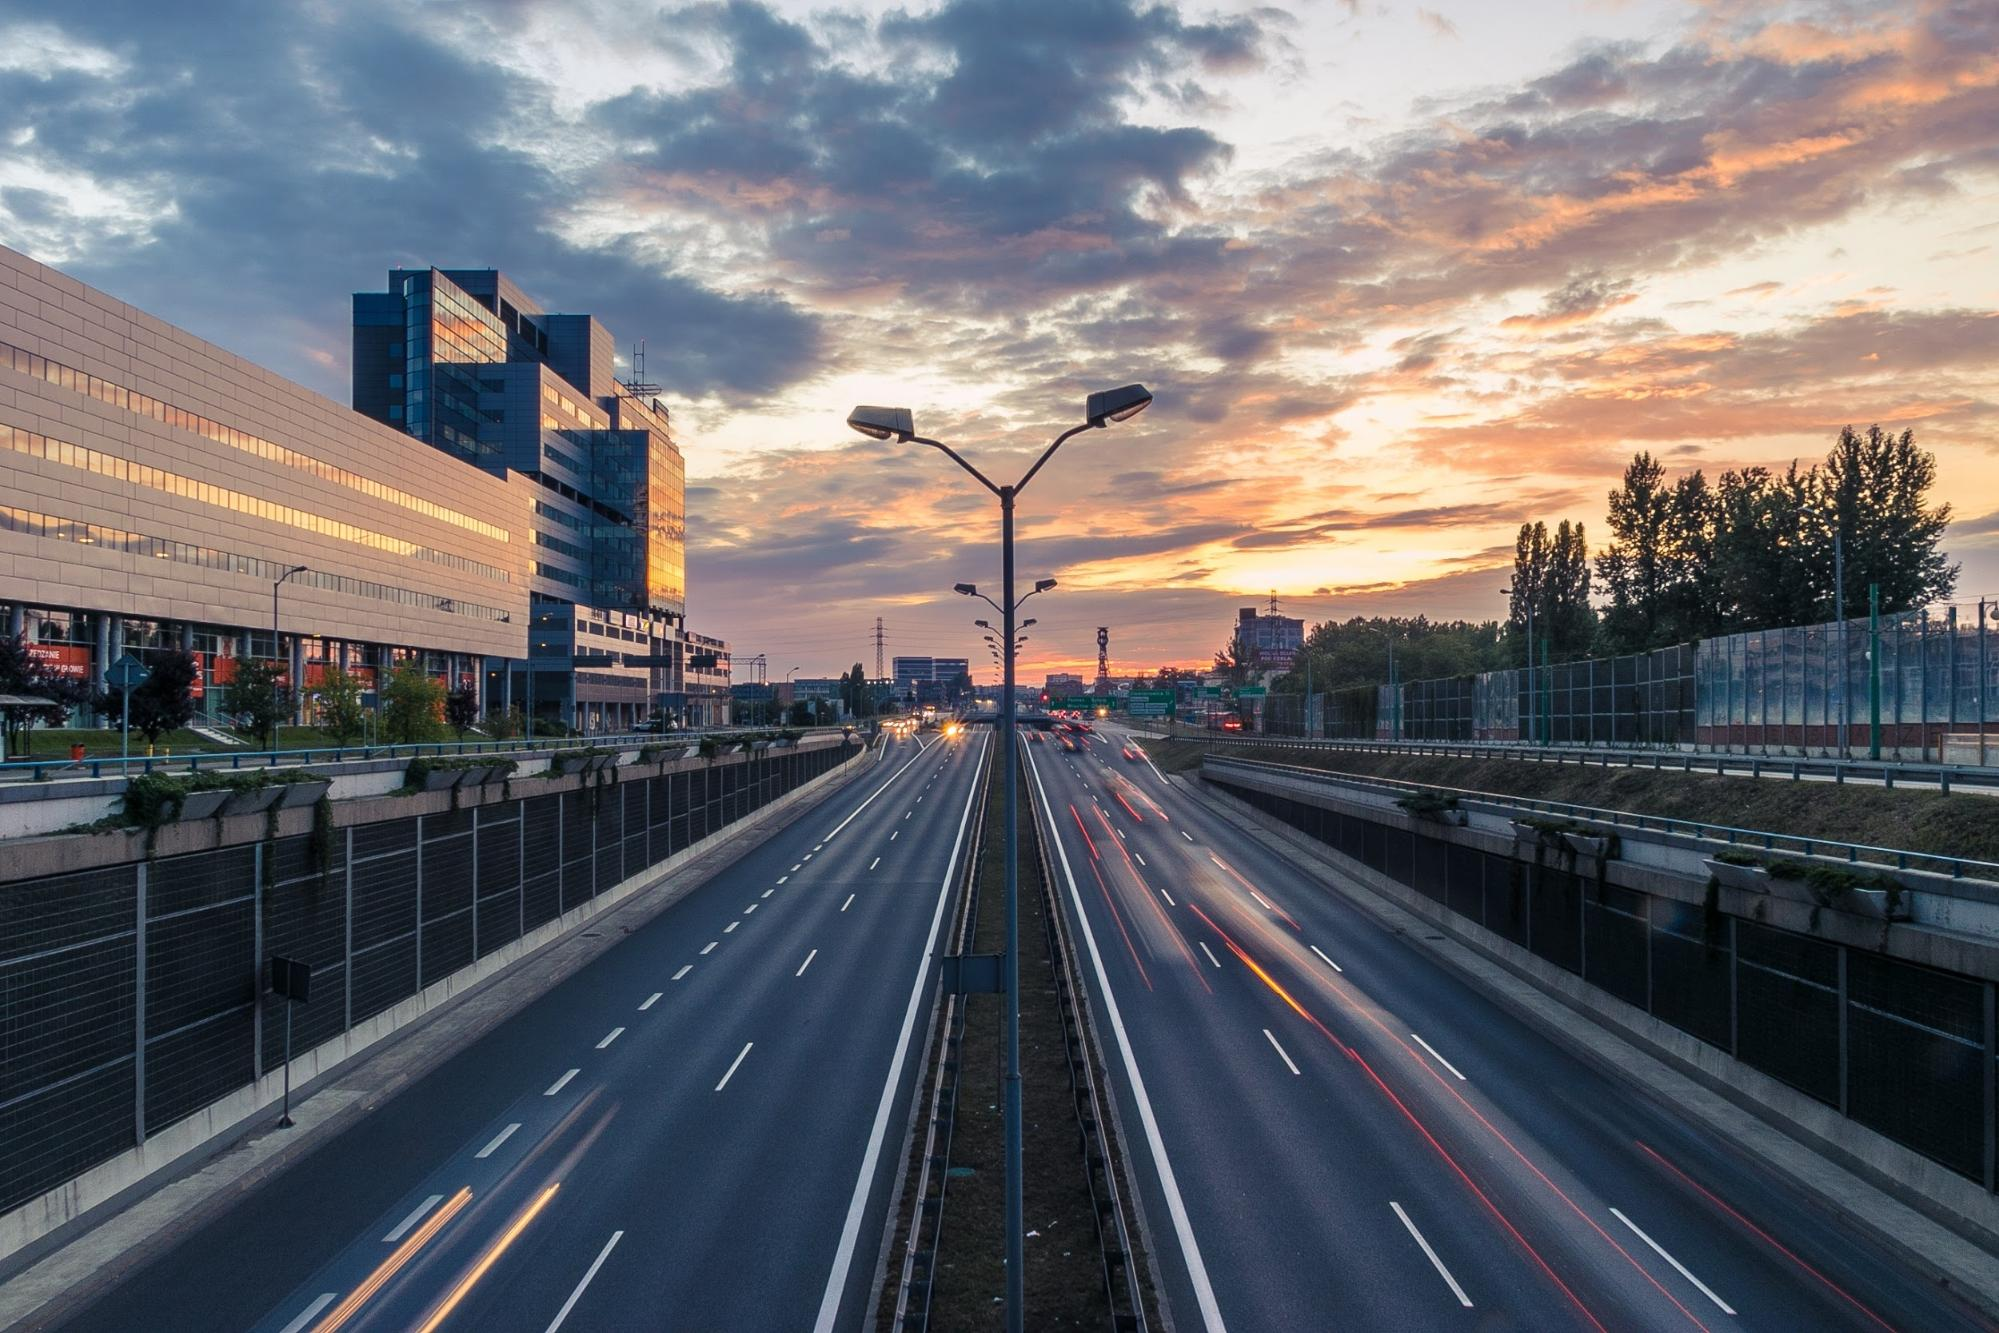 How to Avoid Cross-Border Fees in Car Rental